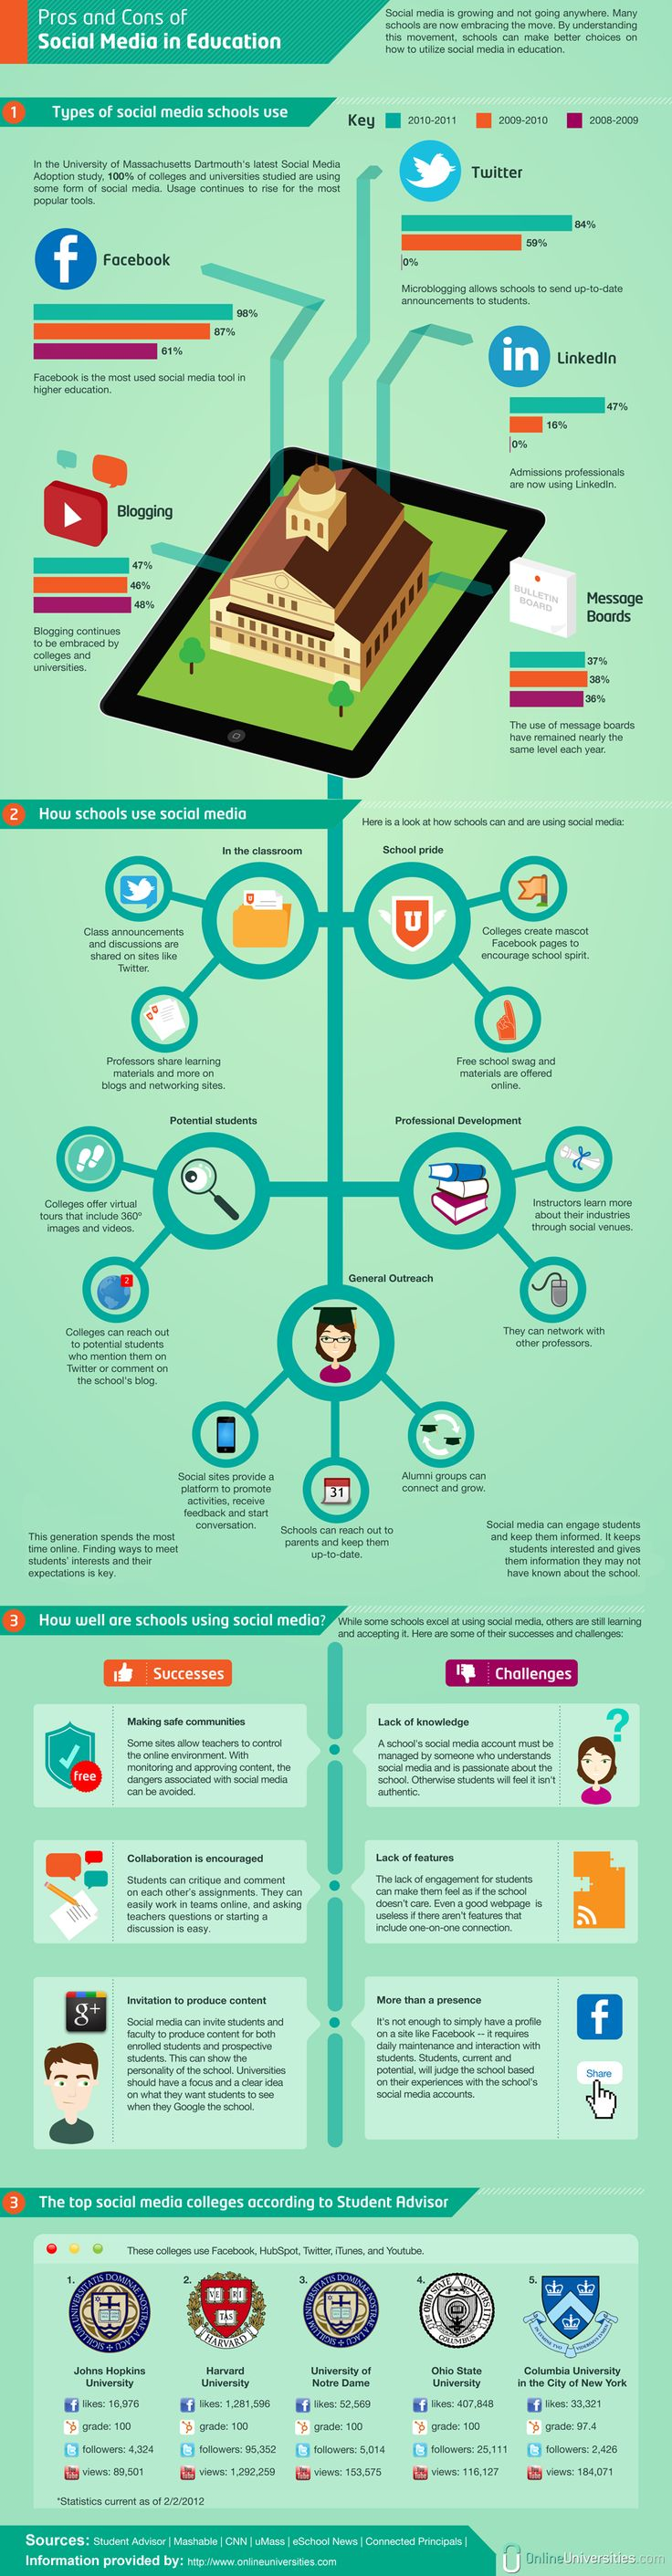 How Higher Education Uses Social Media